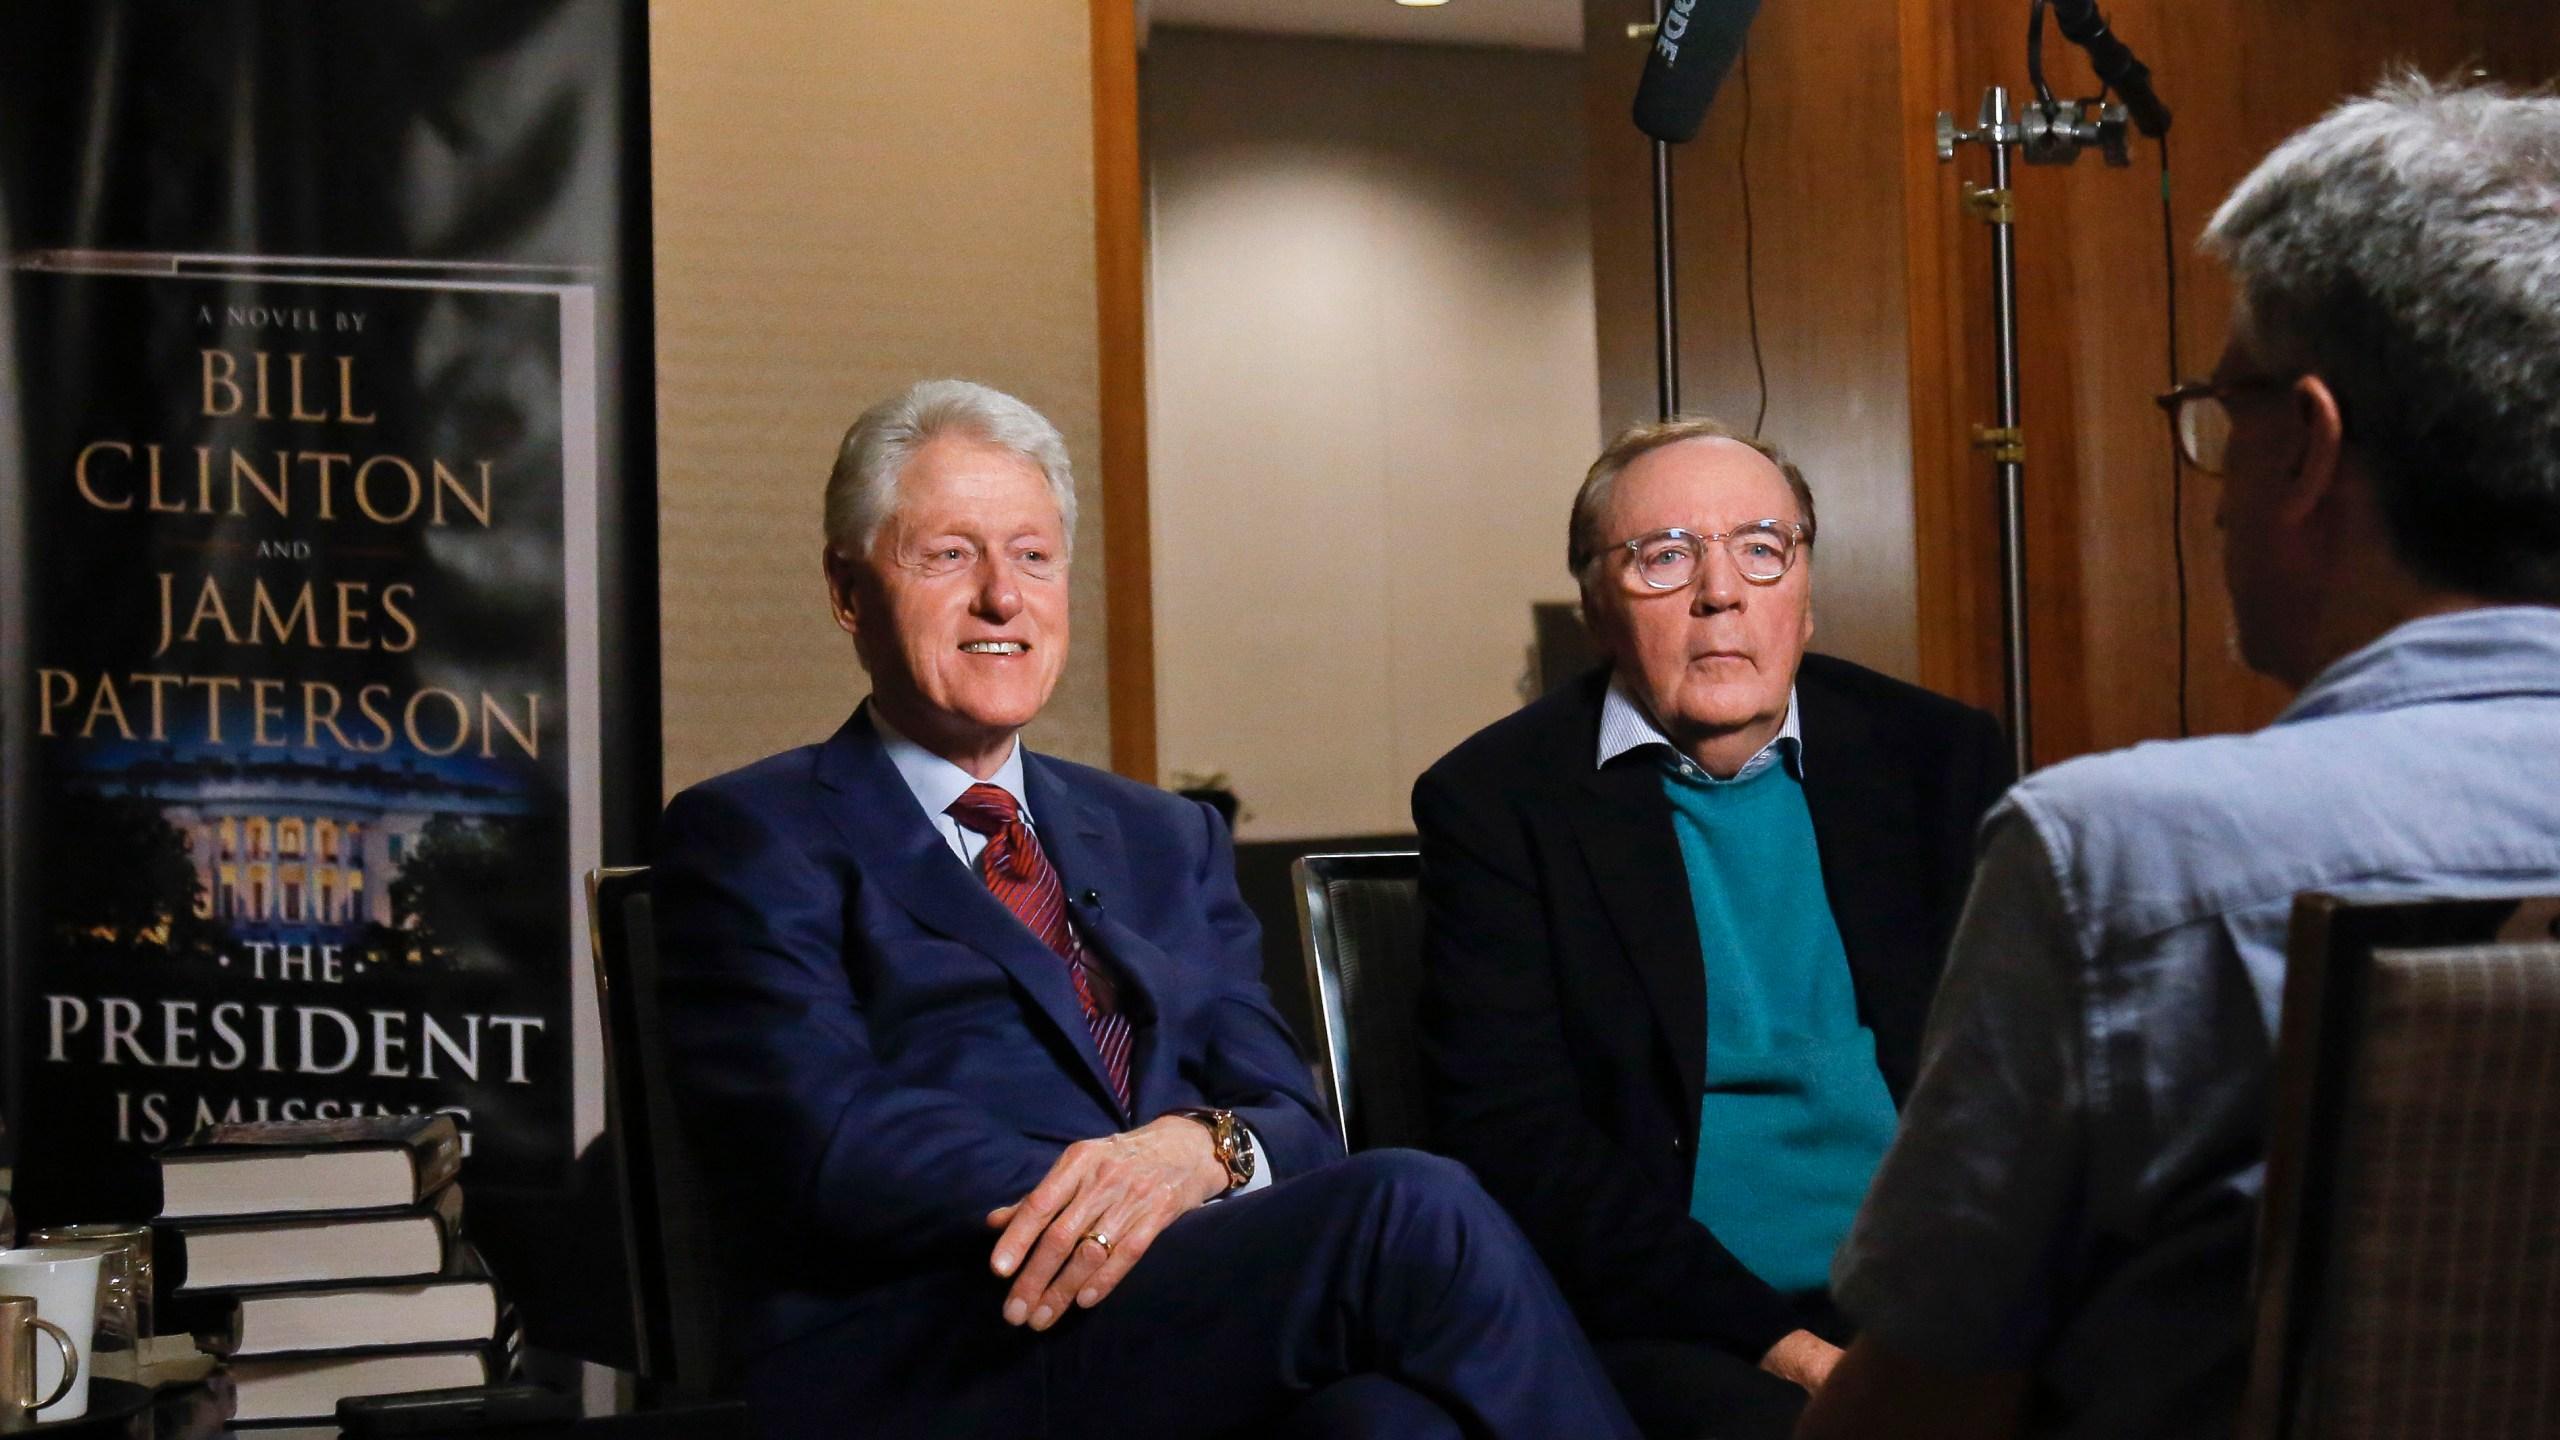 Bill Clinton, Patterson